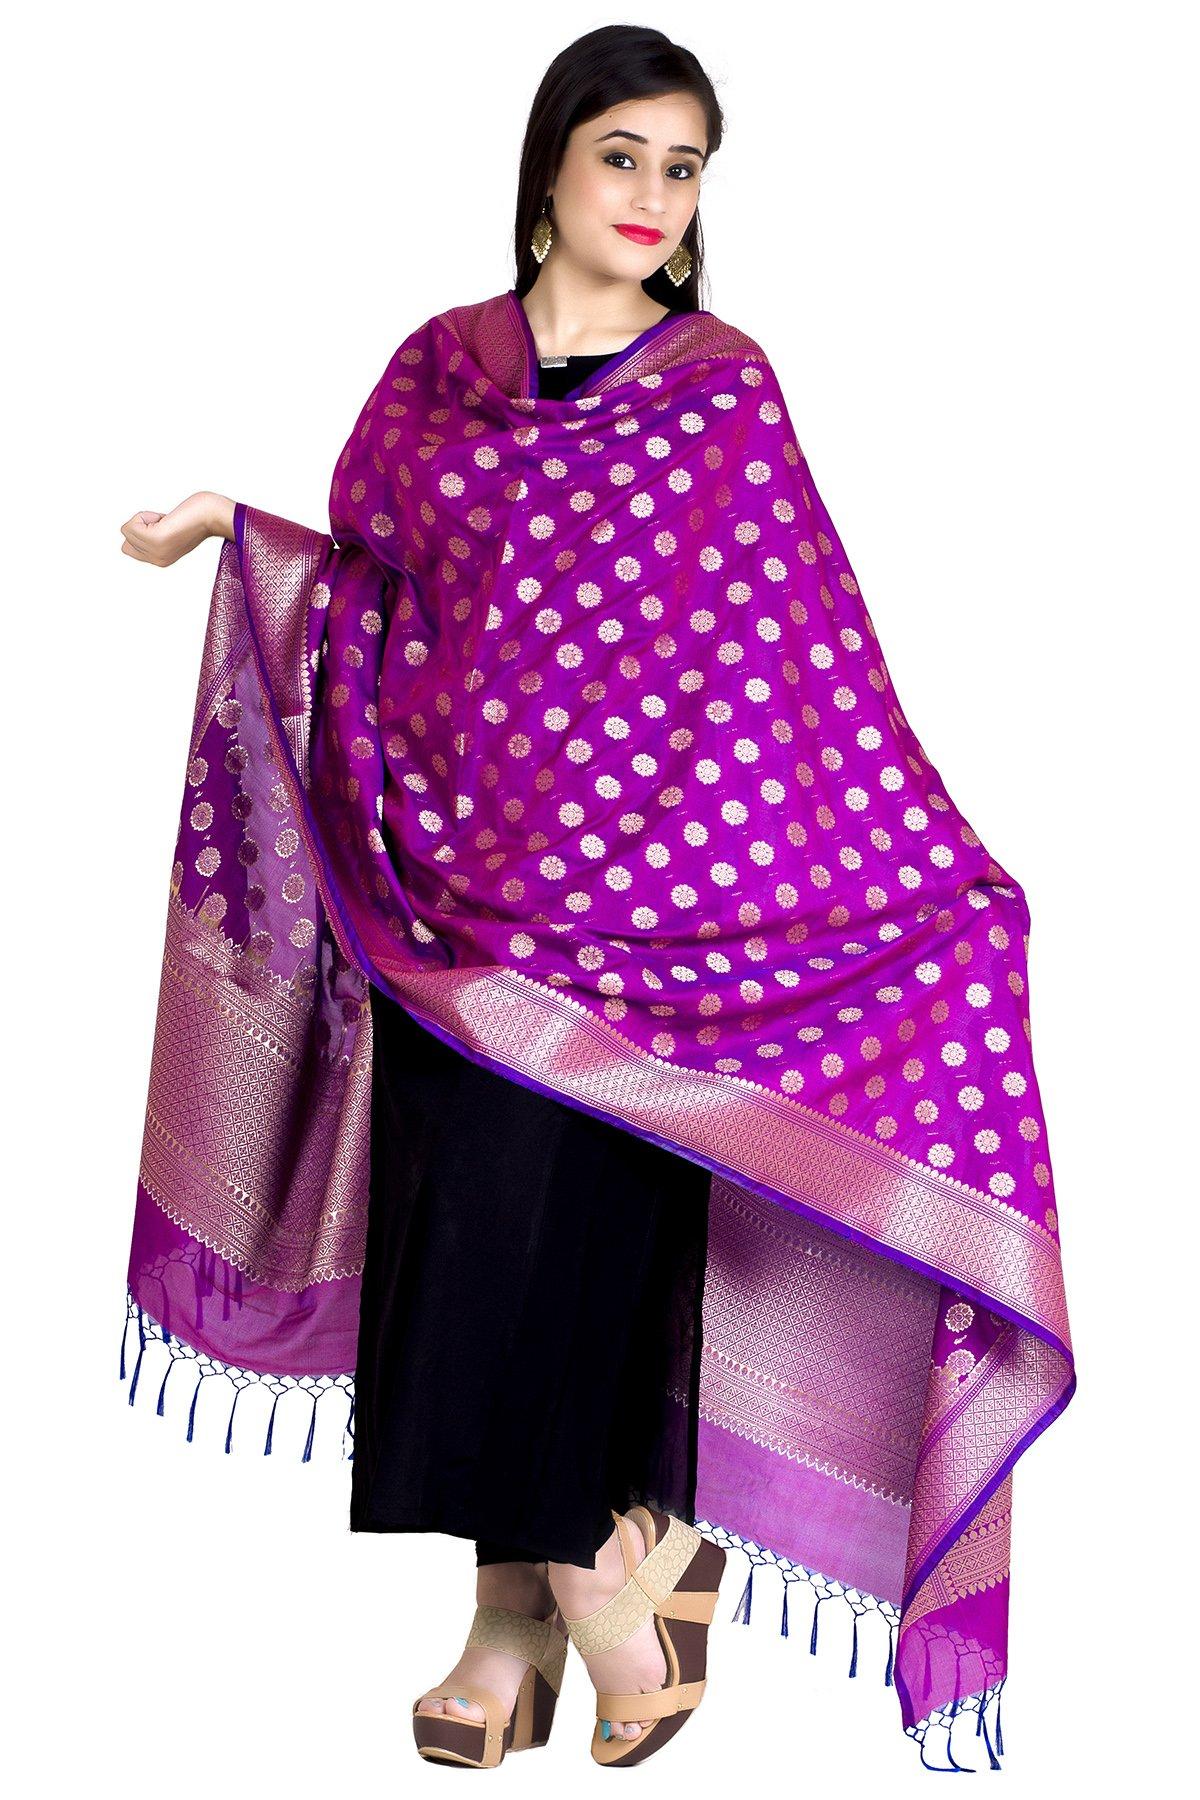 Chandrakala Women's Kataan Silk Blend Cutwork Brocade Banarasi Dupatta (Purple)